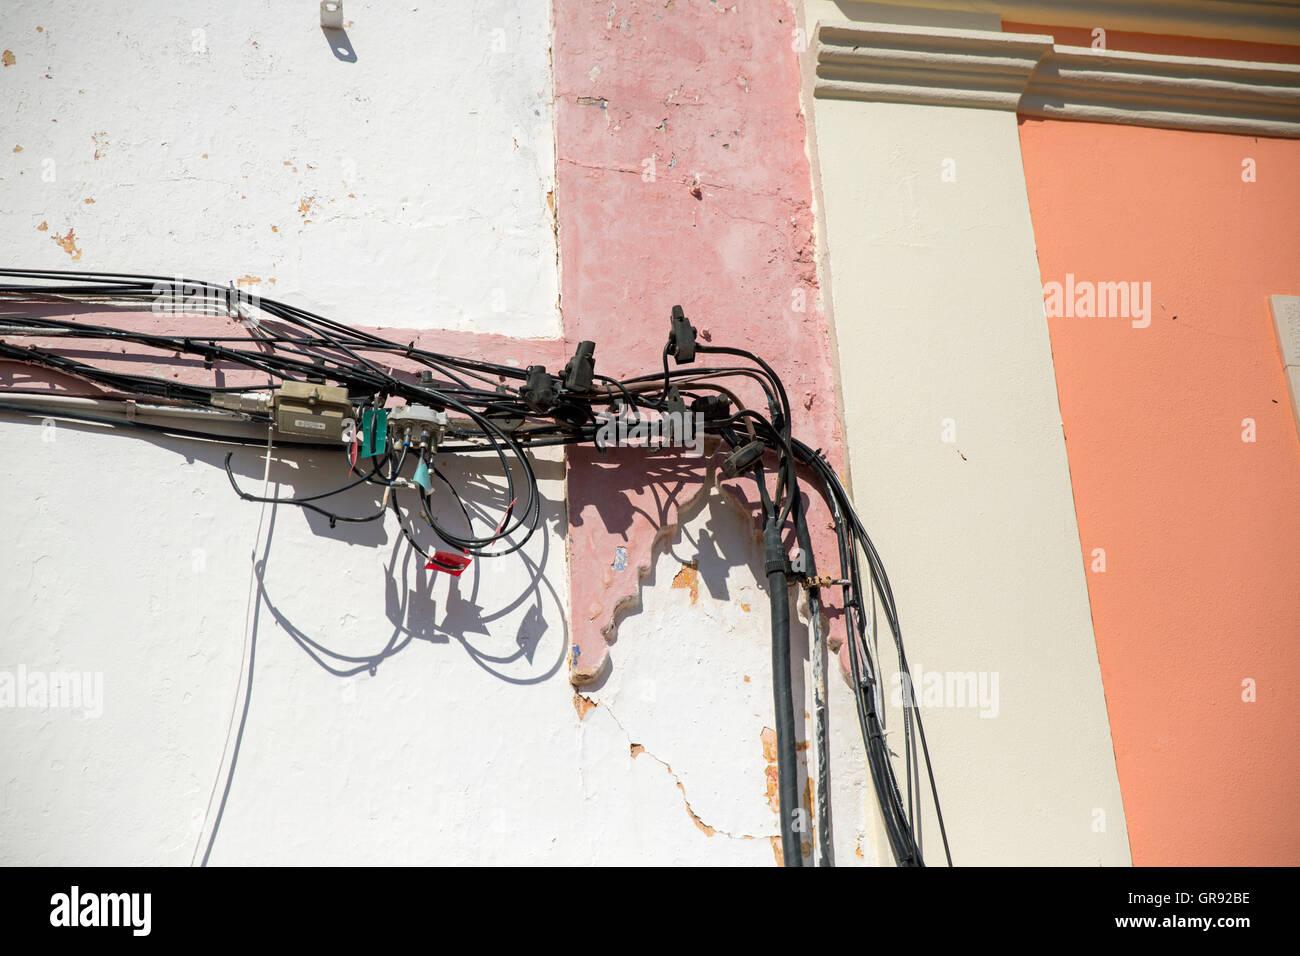 Wiring House Stockfotos & Wiring House Bilder - Alamy